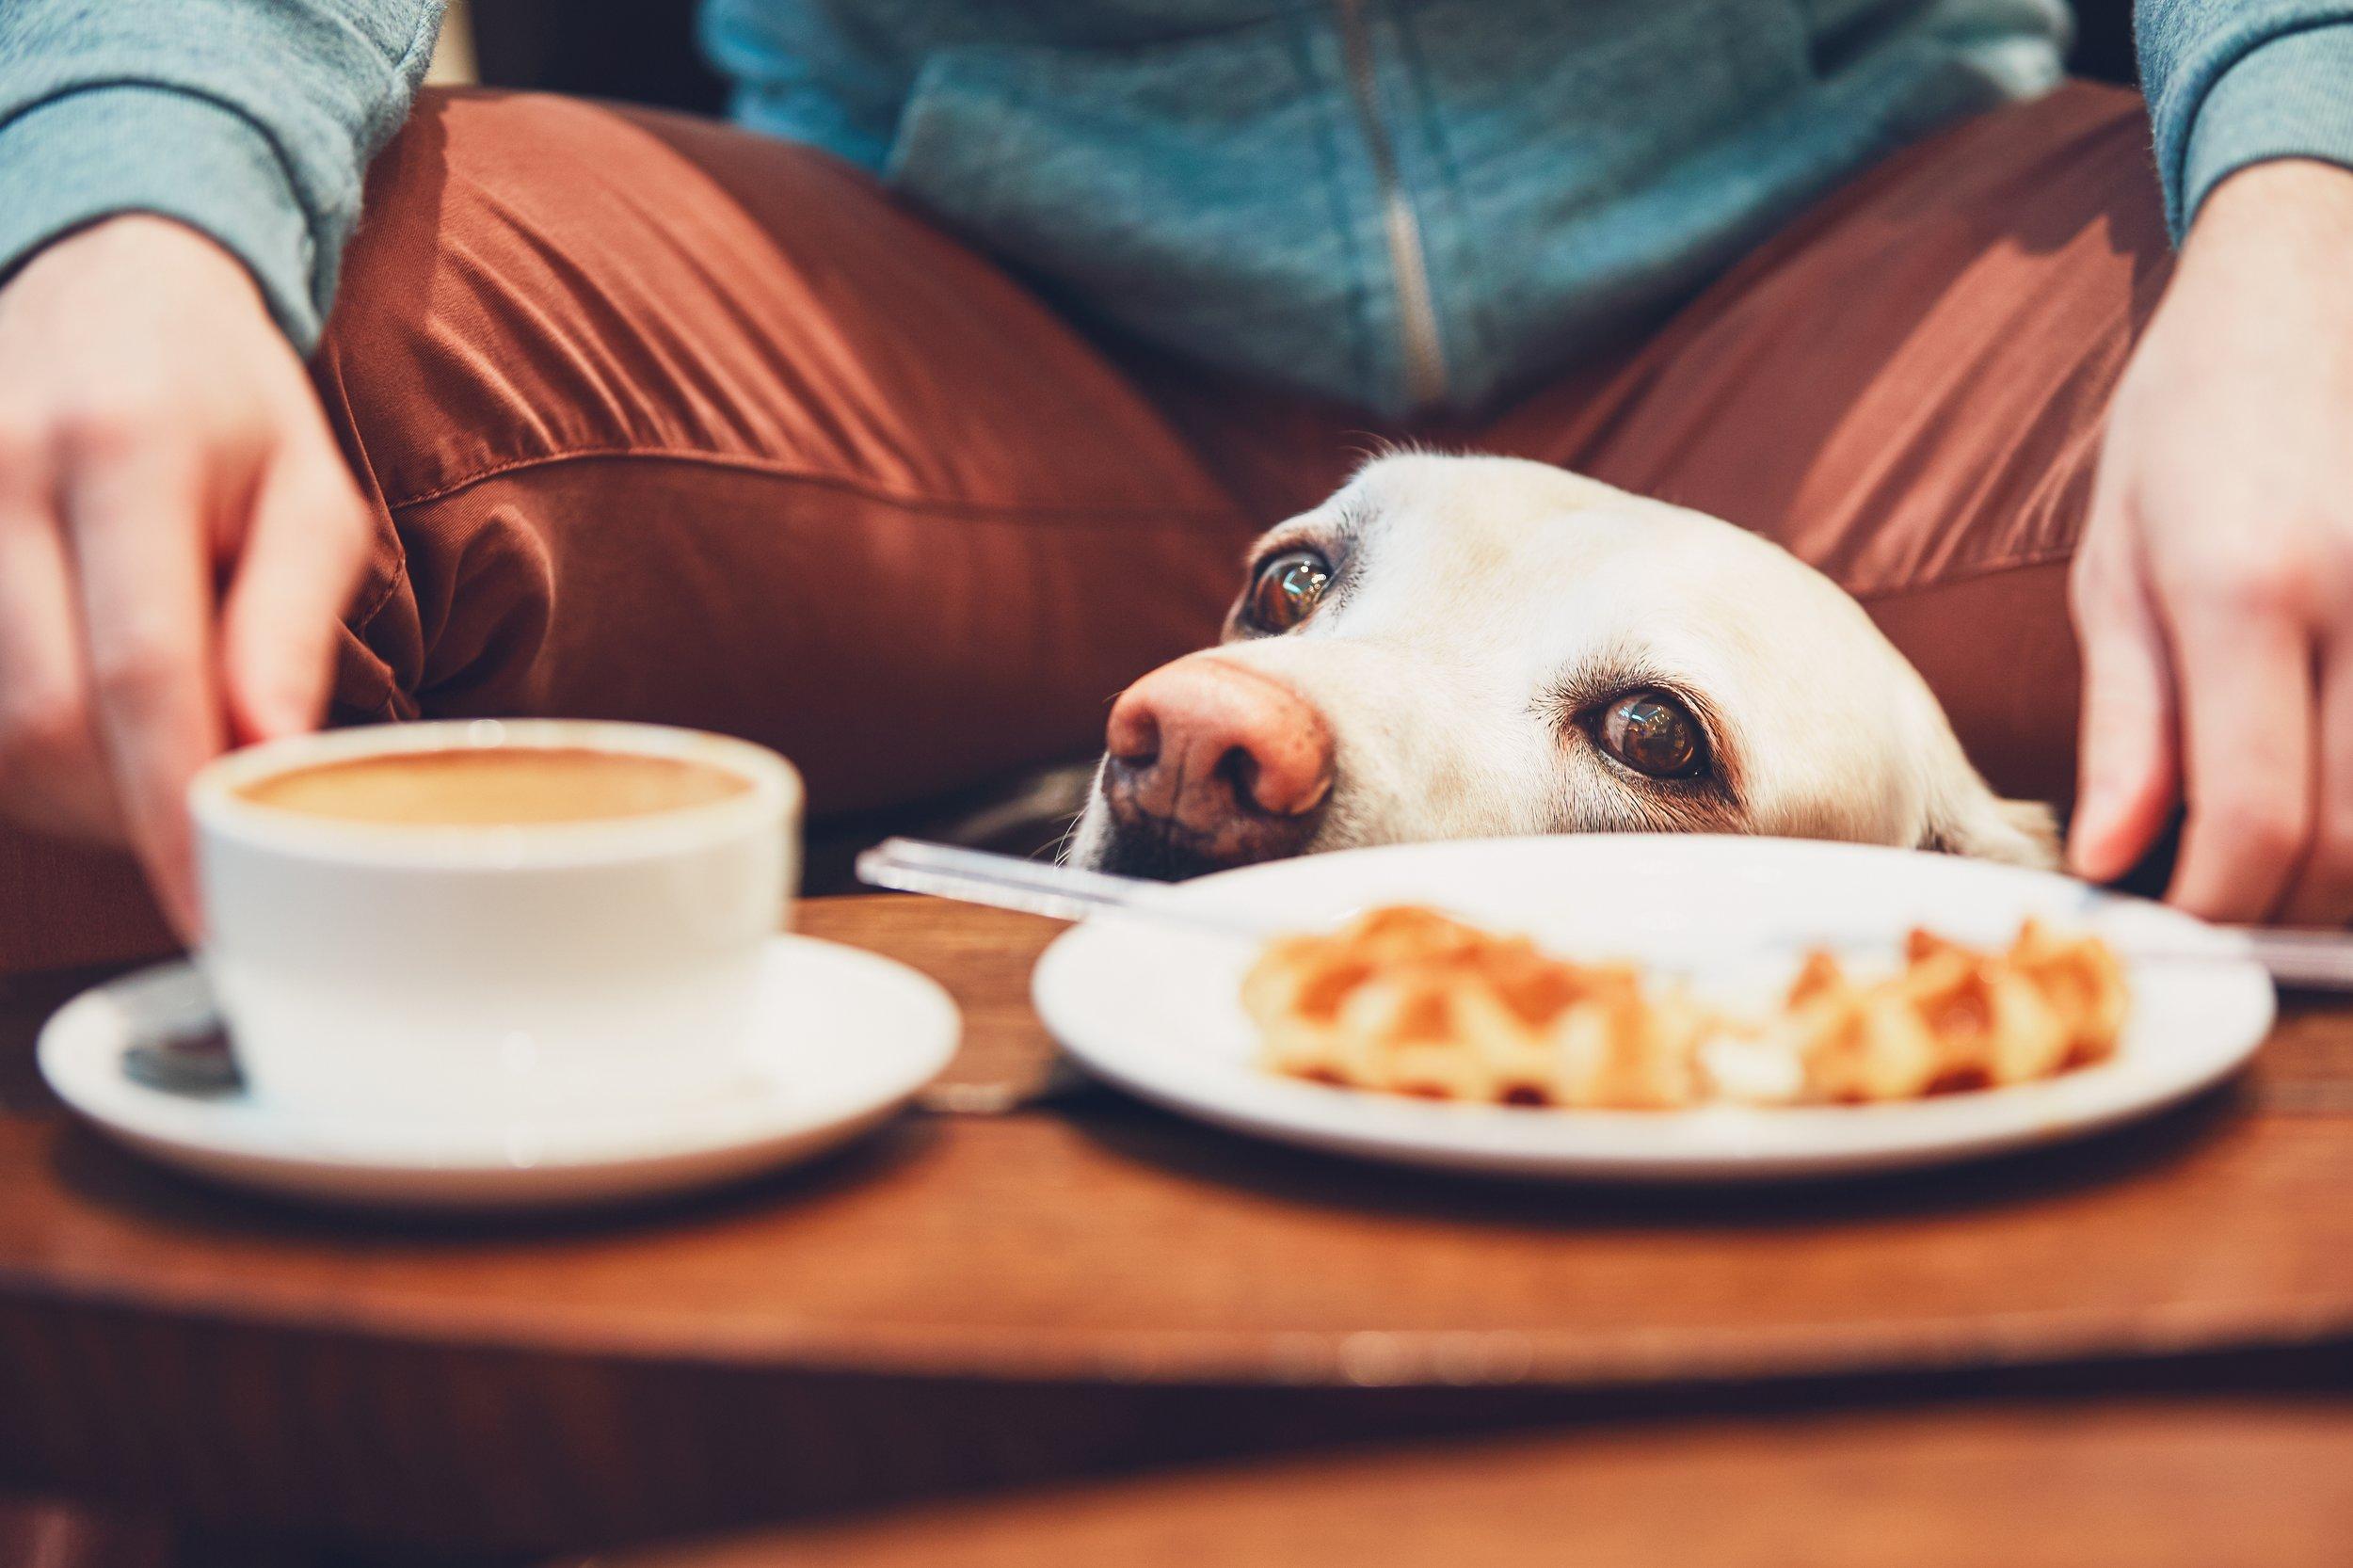 curious-dog-in-the-cafe-PT2BLZC.jpg